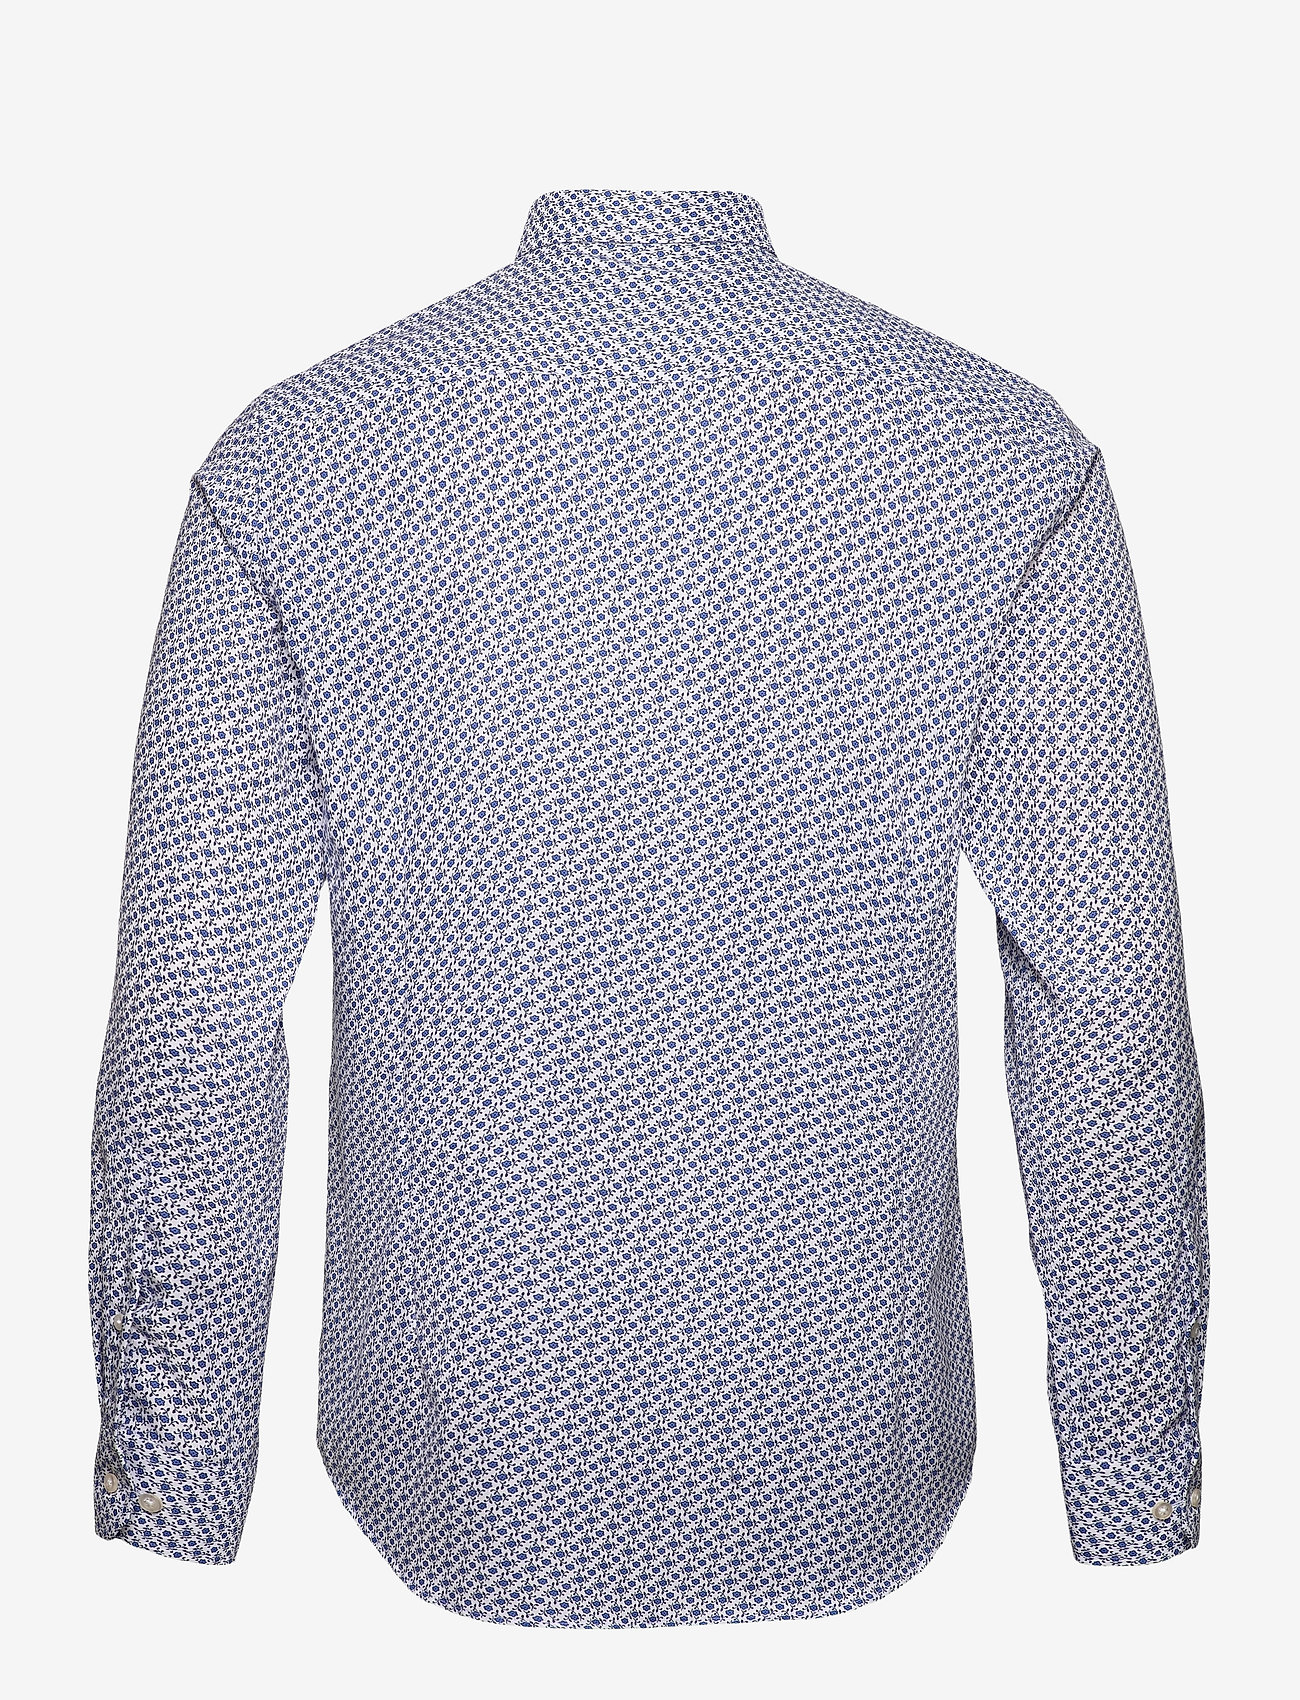 Bosweel Shirts Est. 1937 - Small flowers on white Oxford - chemises décontractées - blue - 1